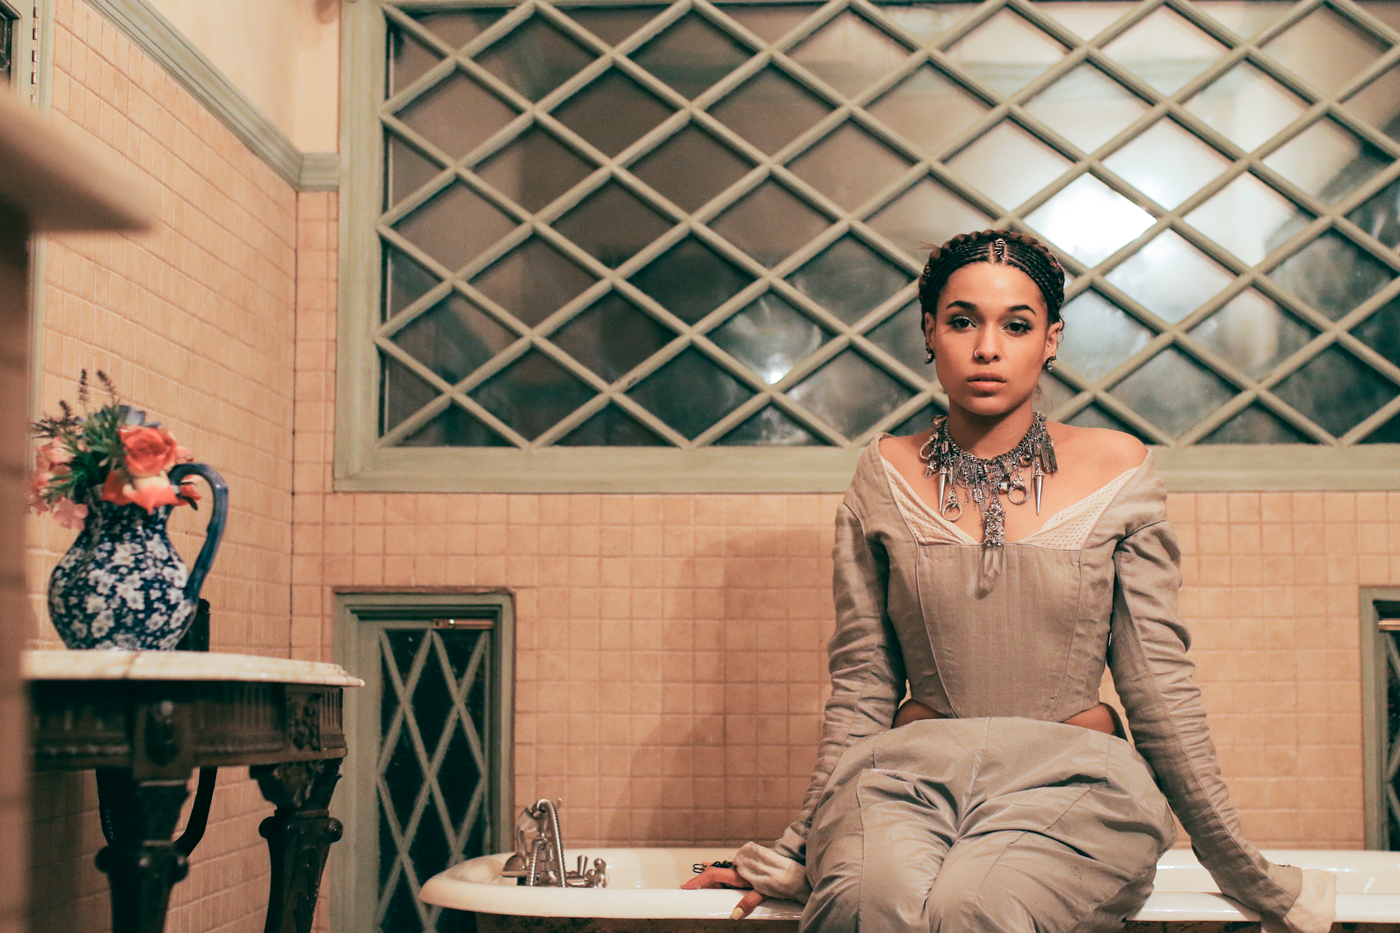 princess-nokia-interview-martell-home-live-yard-1